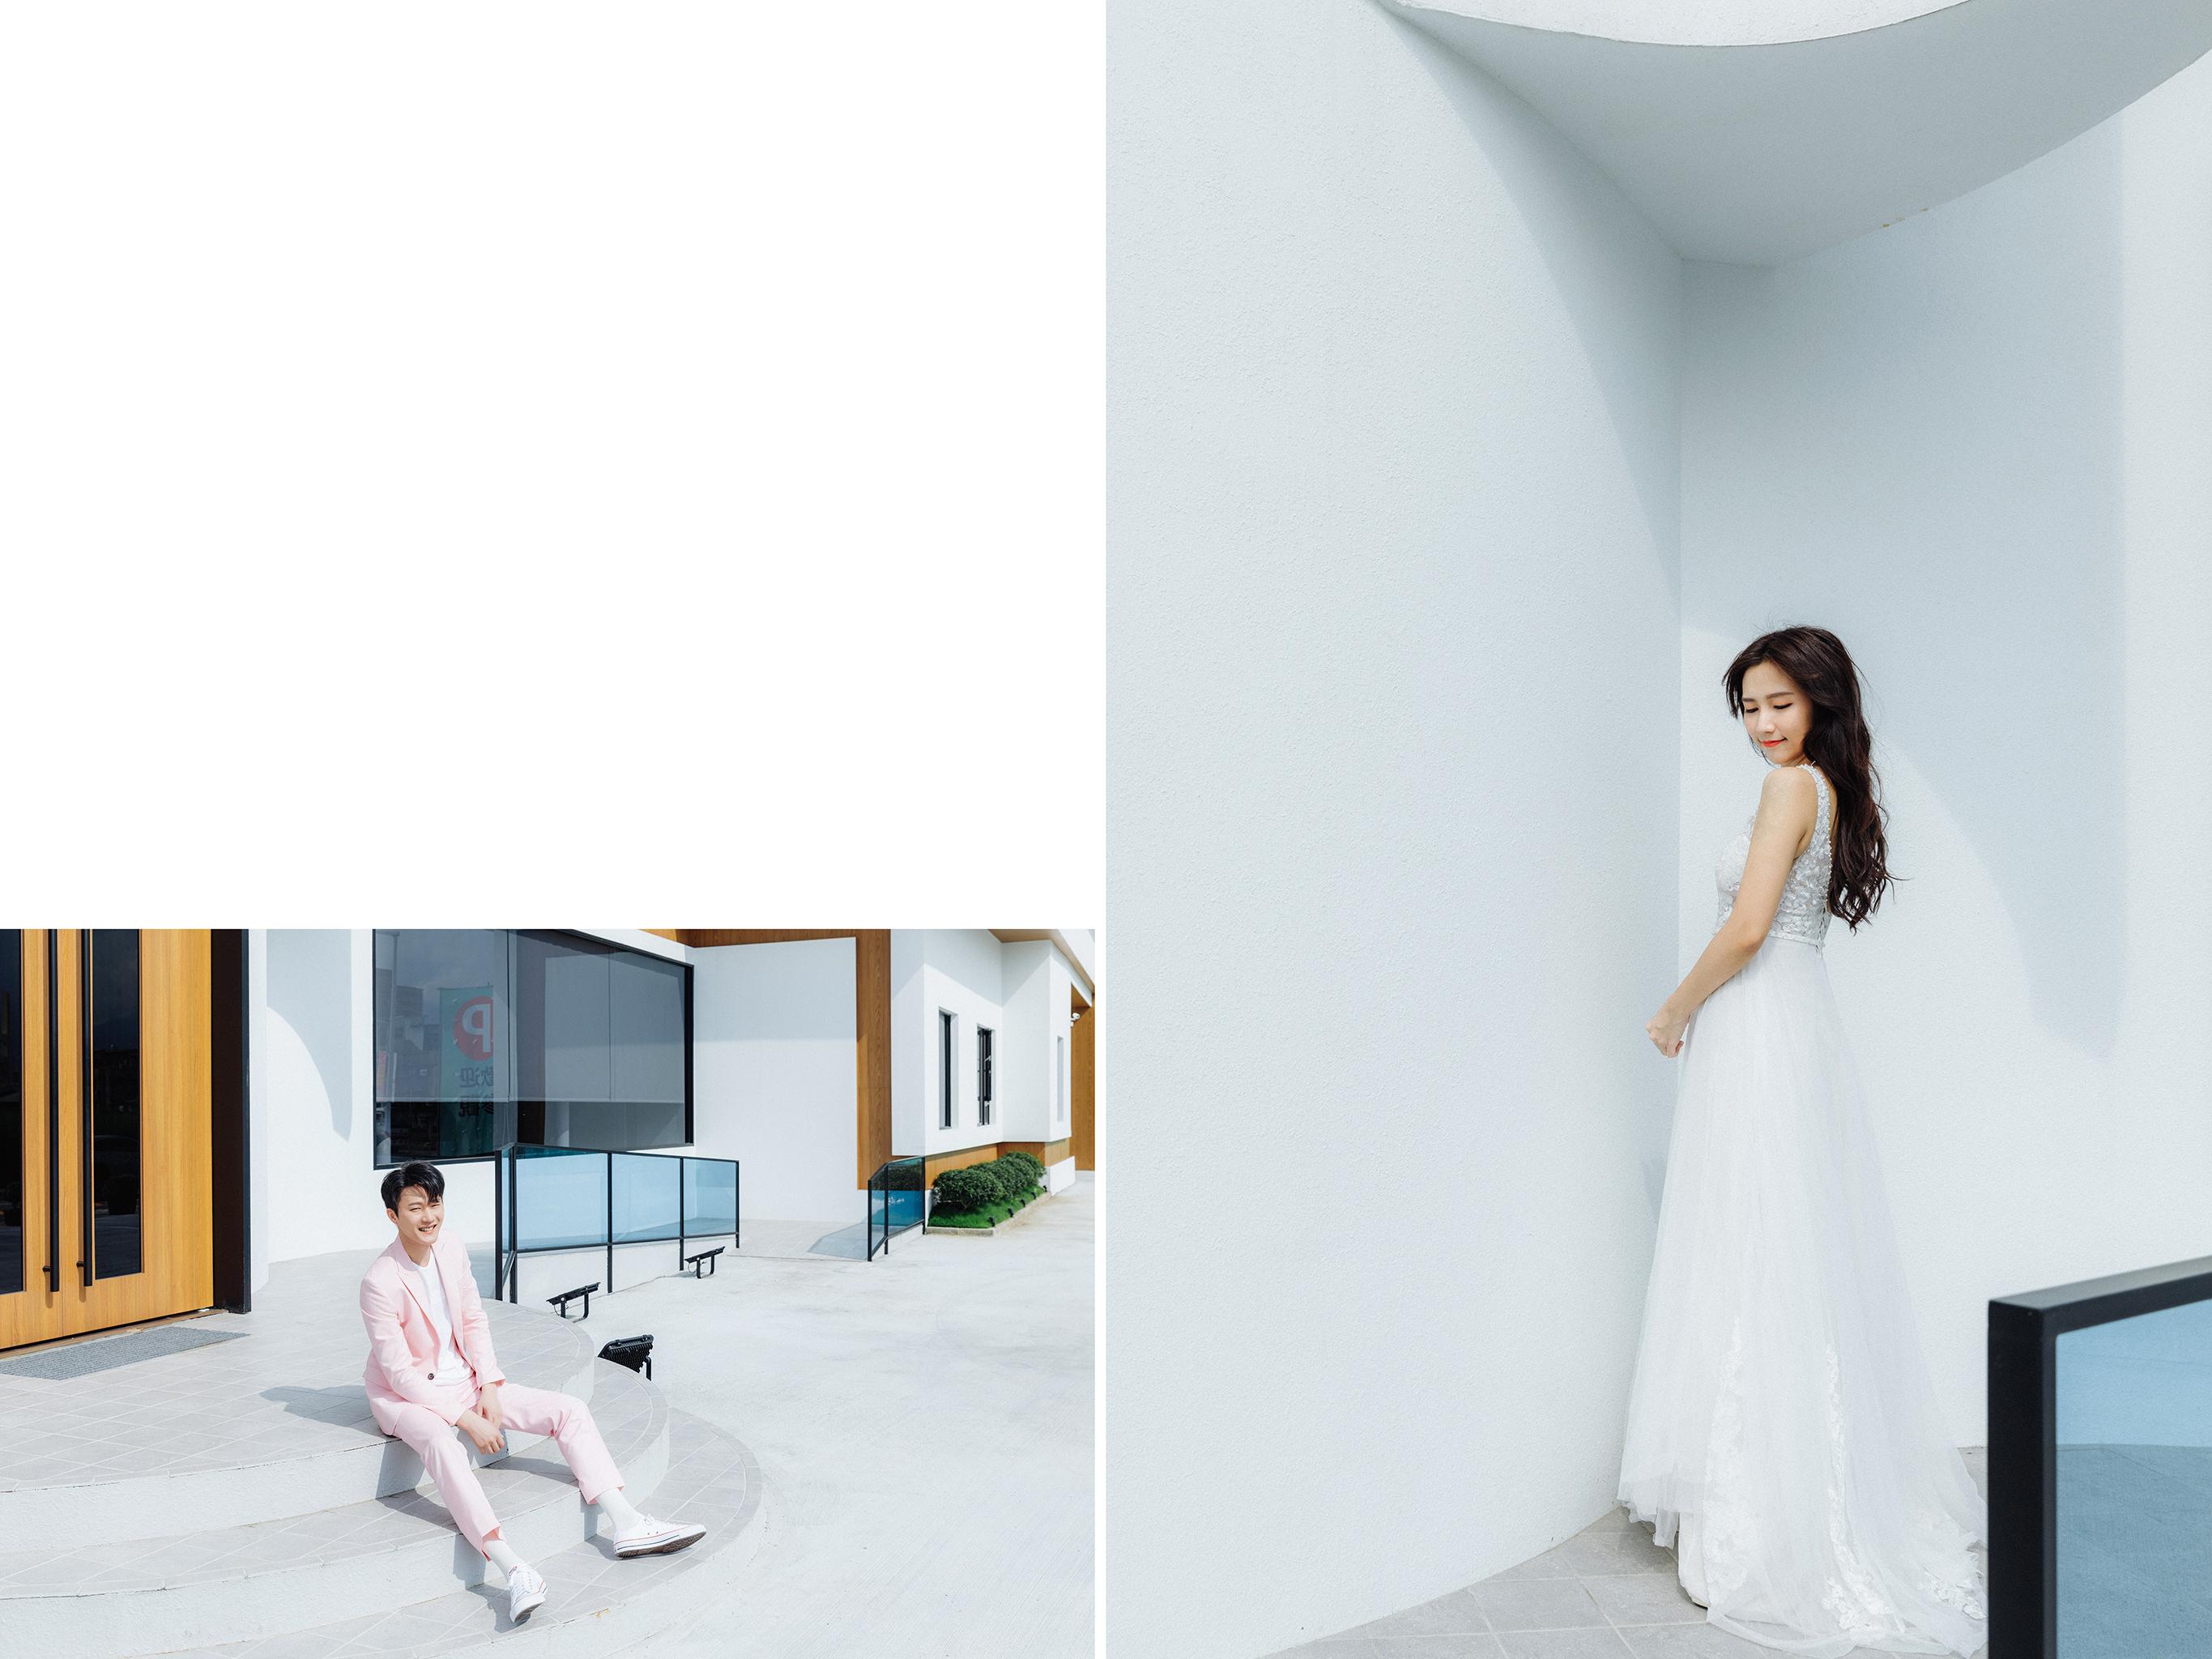 48592352862 d12c331821 o - 【自主婚紗】+Ying&Wiwi+